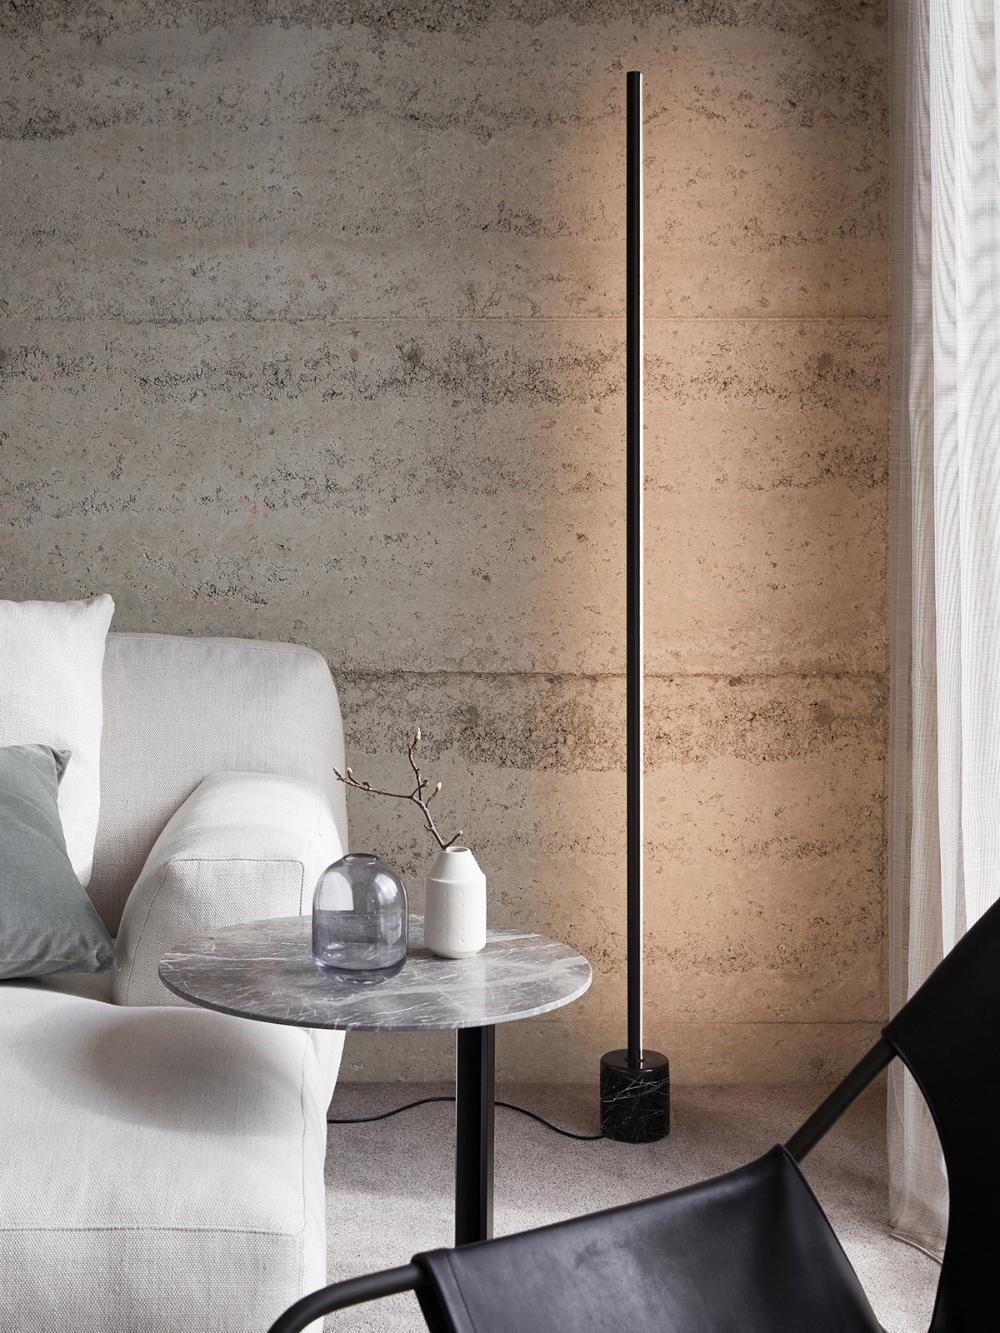 Ledlux Emmerson Led Dimmable Black Floor Lamp Met Afbeeldingen Moderne Staande Lampen Vloerlampen Woonkamer Woonkamerlampen